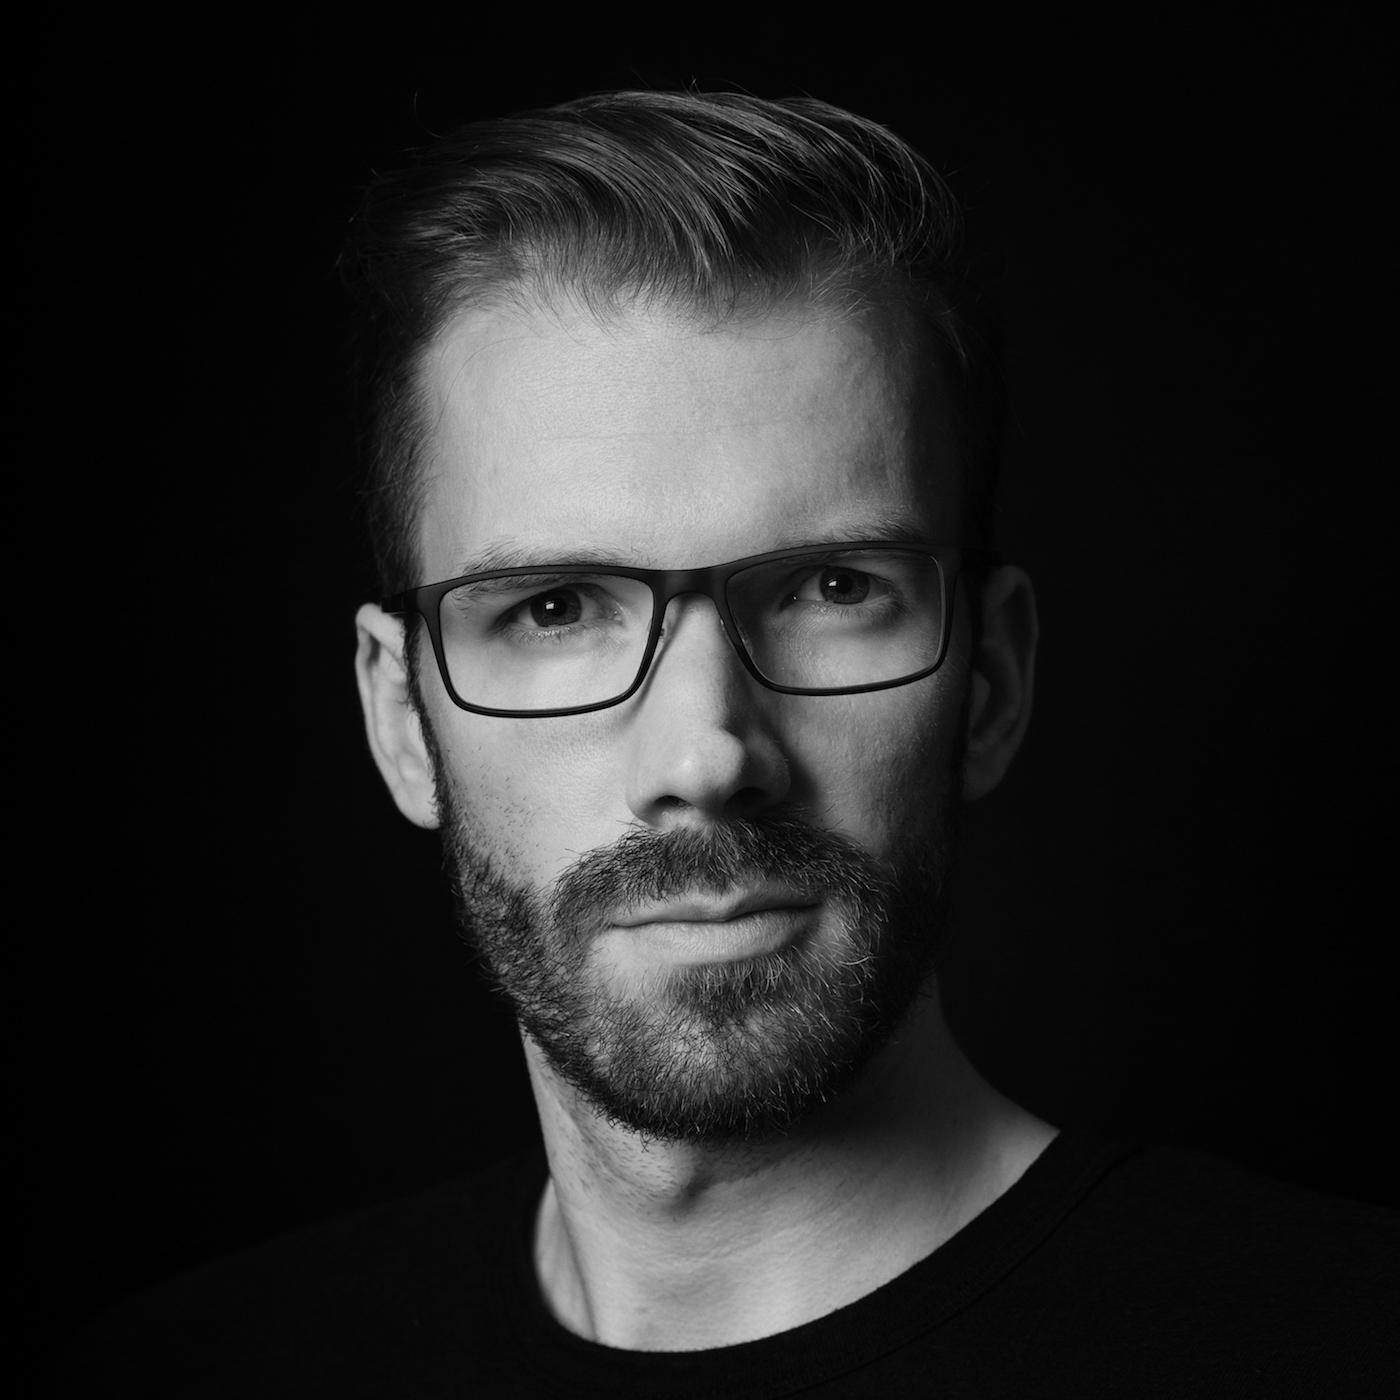 Christian Lendl